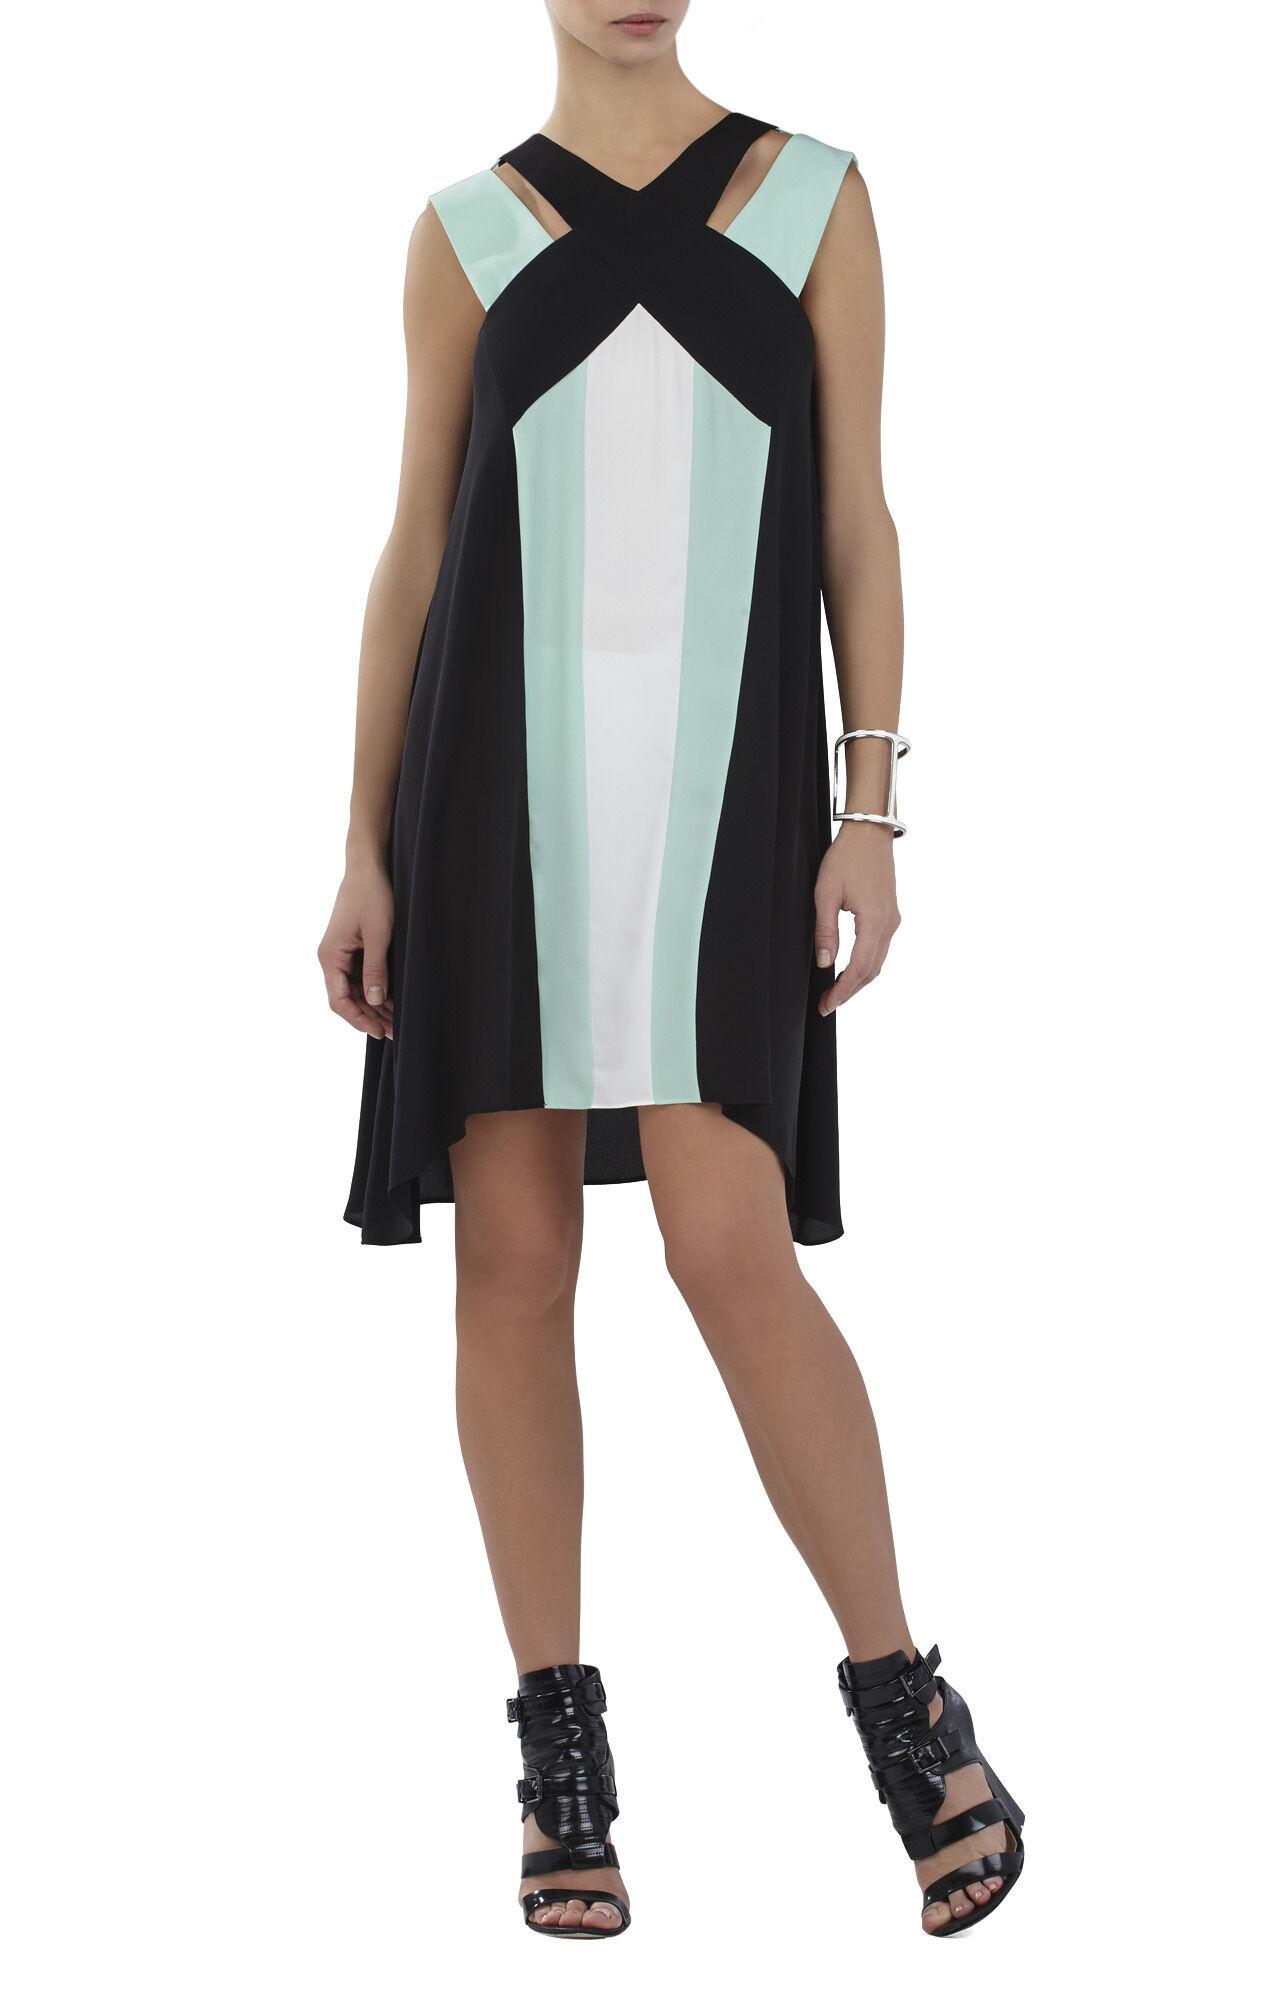 Chantal Crossover Neckline Dress